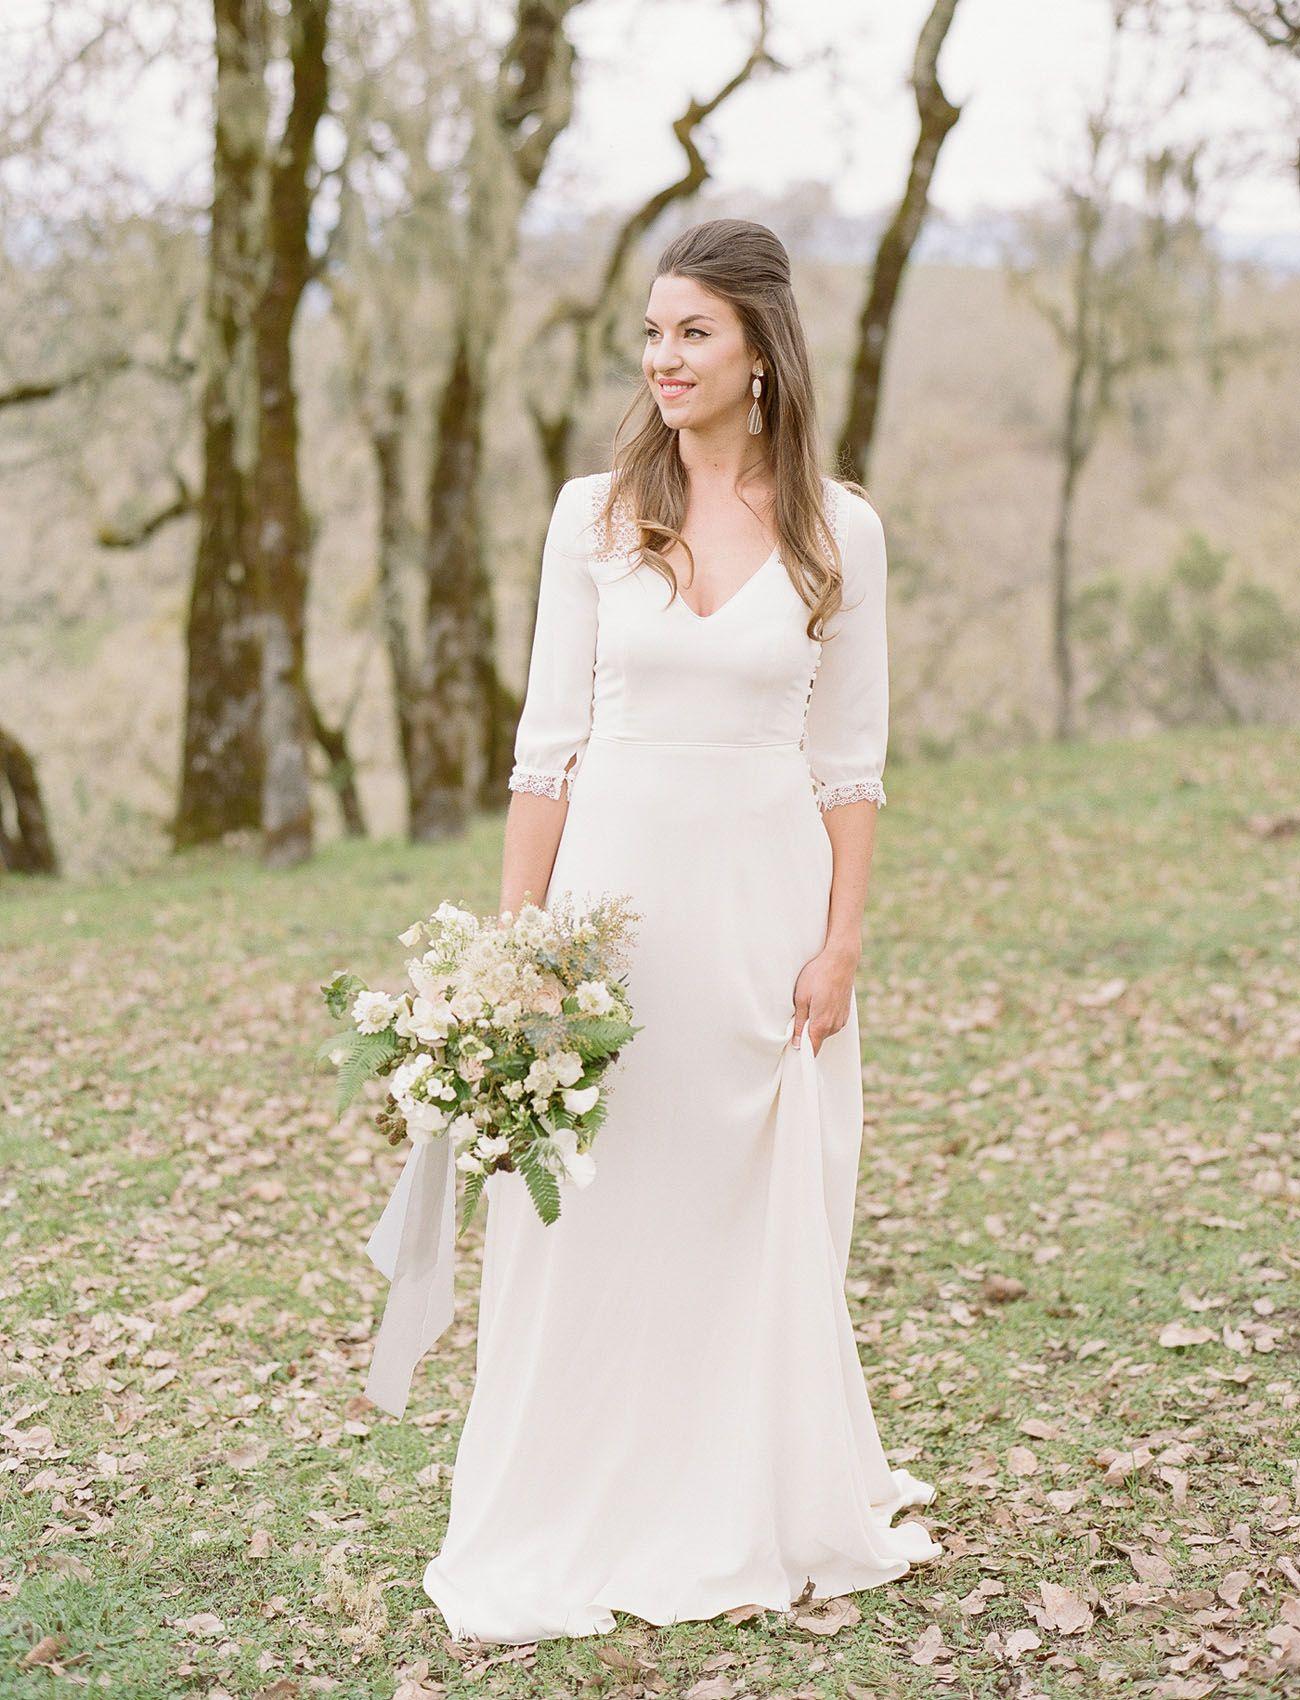 Rustic Scandinavian Wedding Inspiration Green Wedding Shoes Wedding Dresses Images Scandinavian Wedding Inexpensive Wedding Dresses